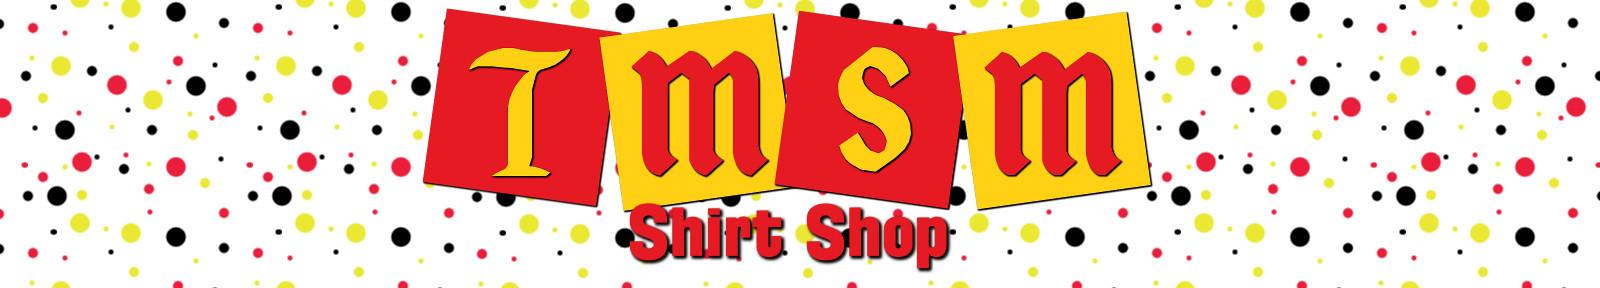 TMSM Shirt Shop Store